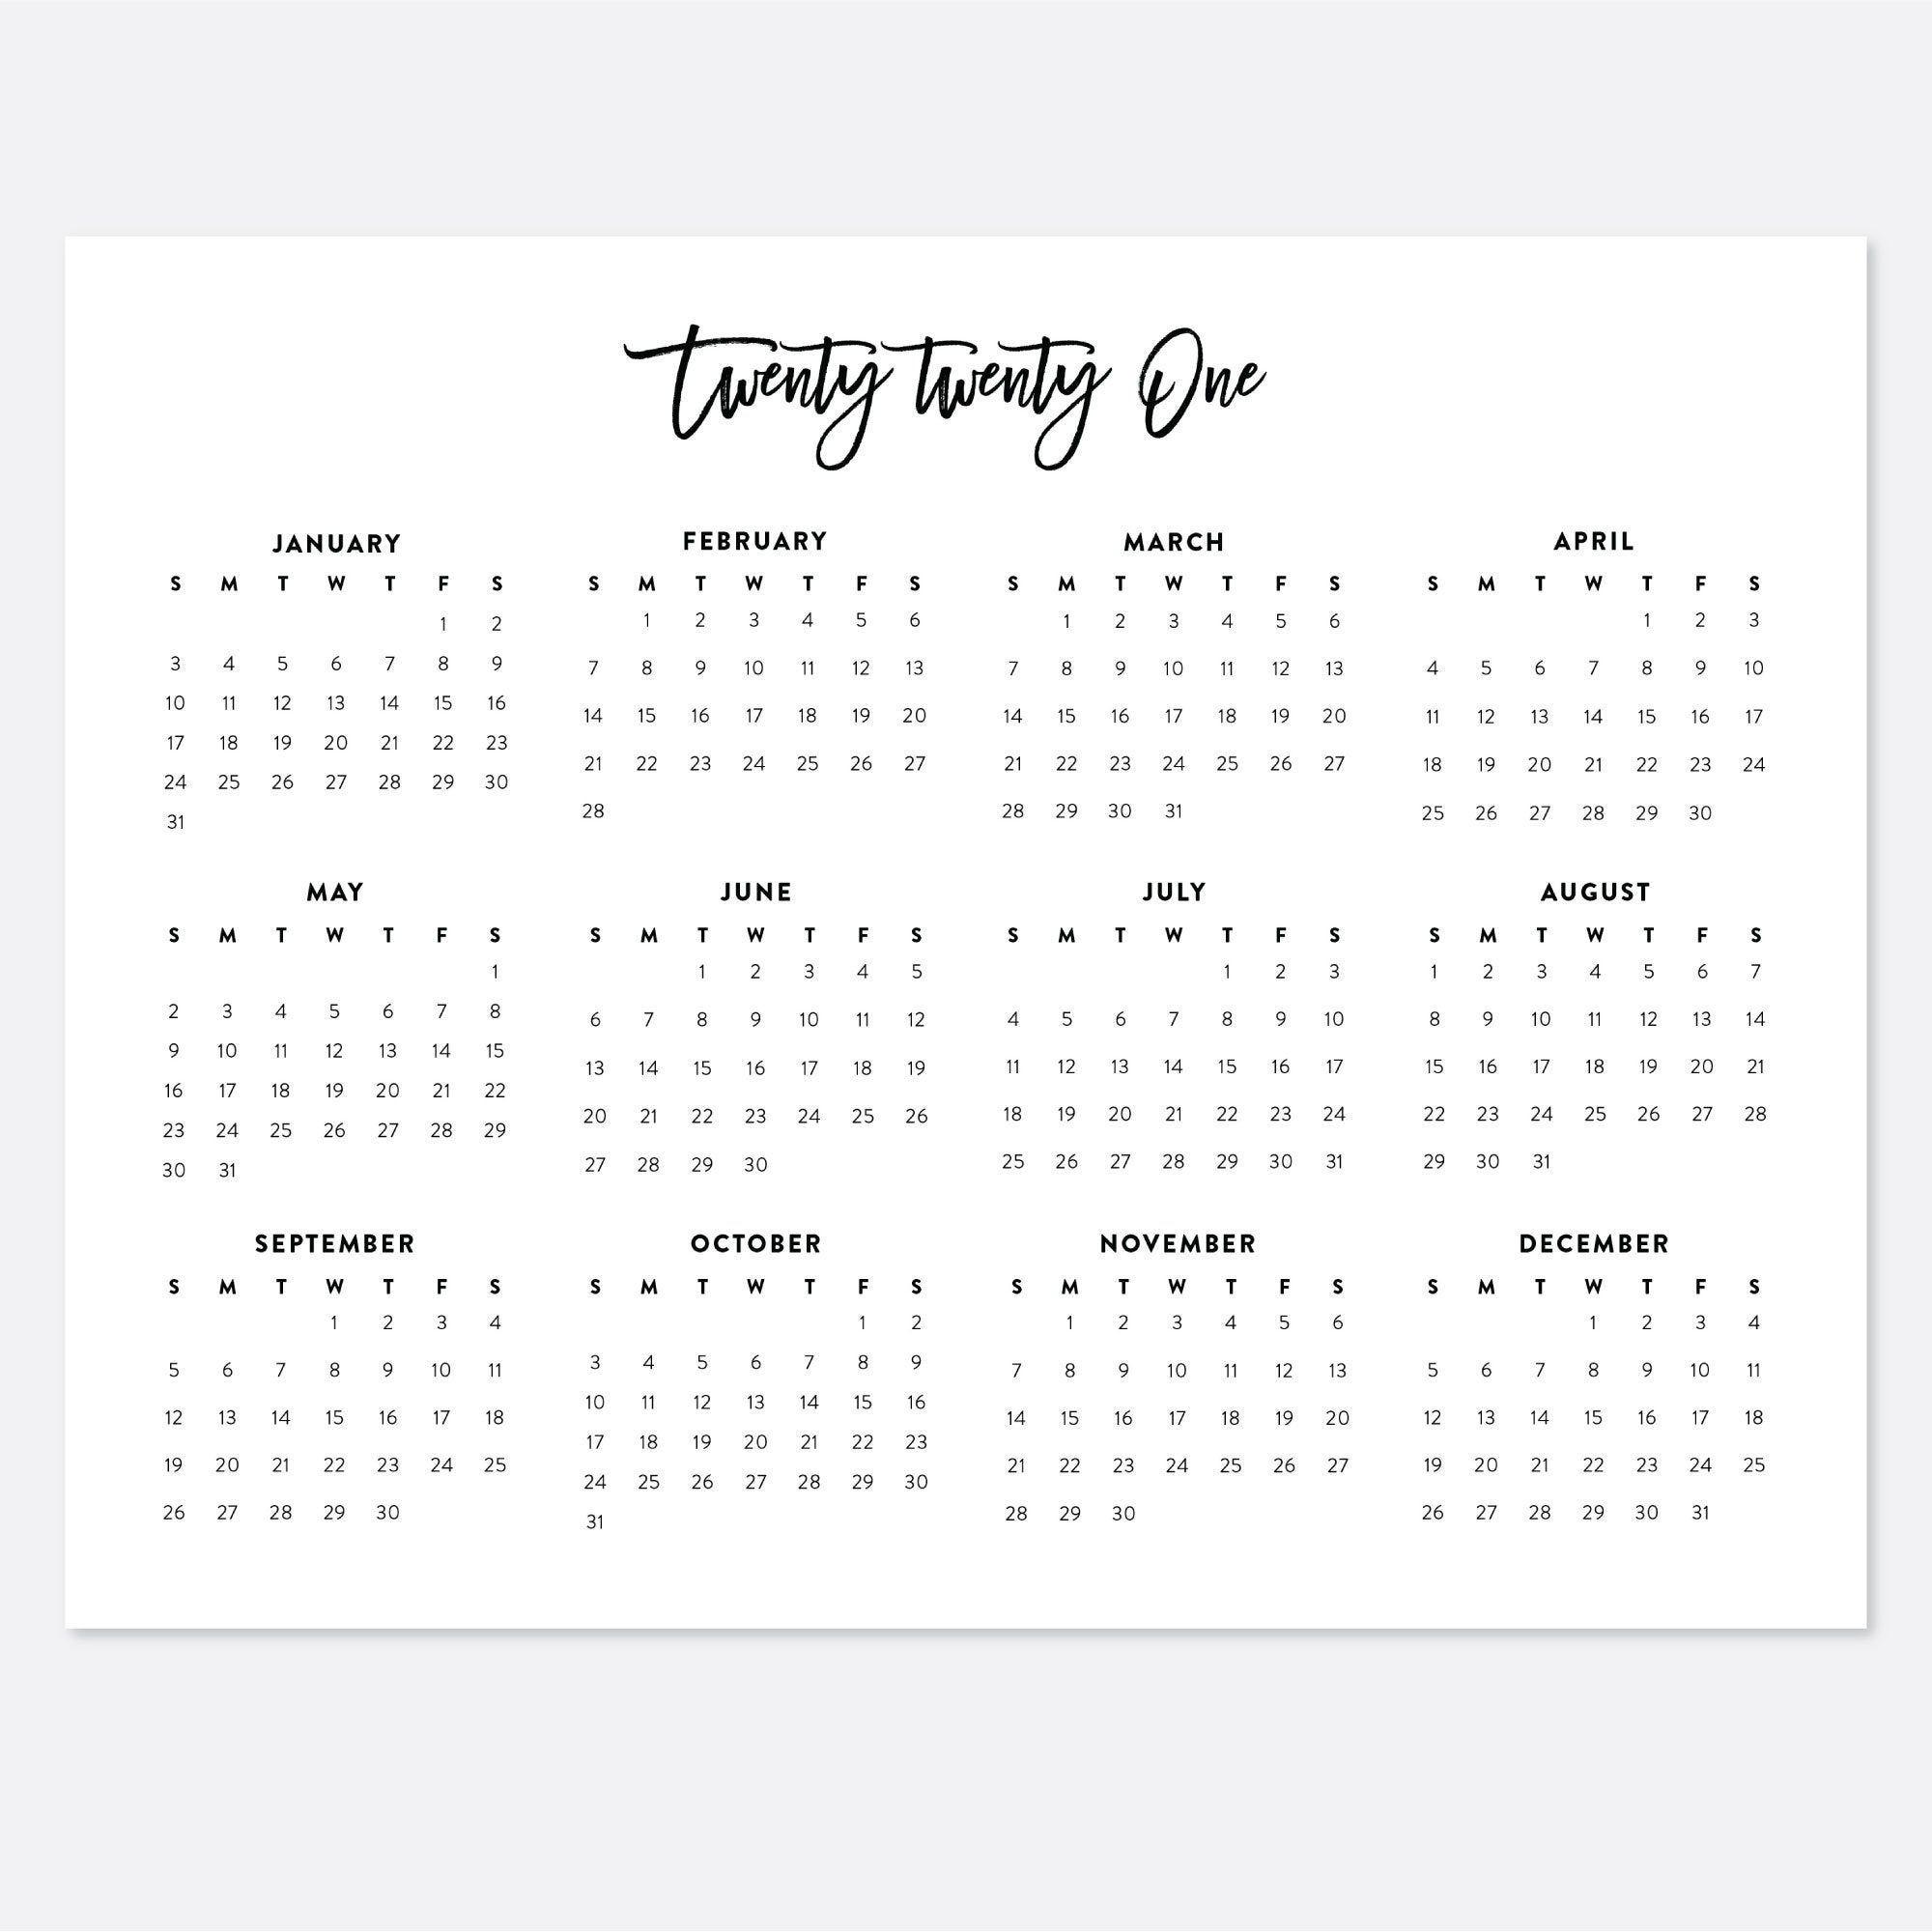 20+ 2021 Calendar 8 5 X 11 - Free Download Printable-Printable 81/2 X 11 January 2021 Calendar